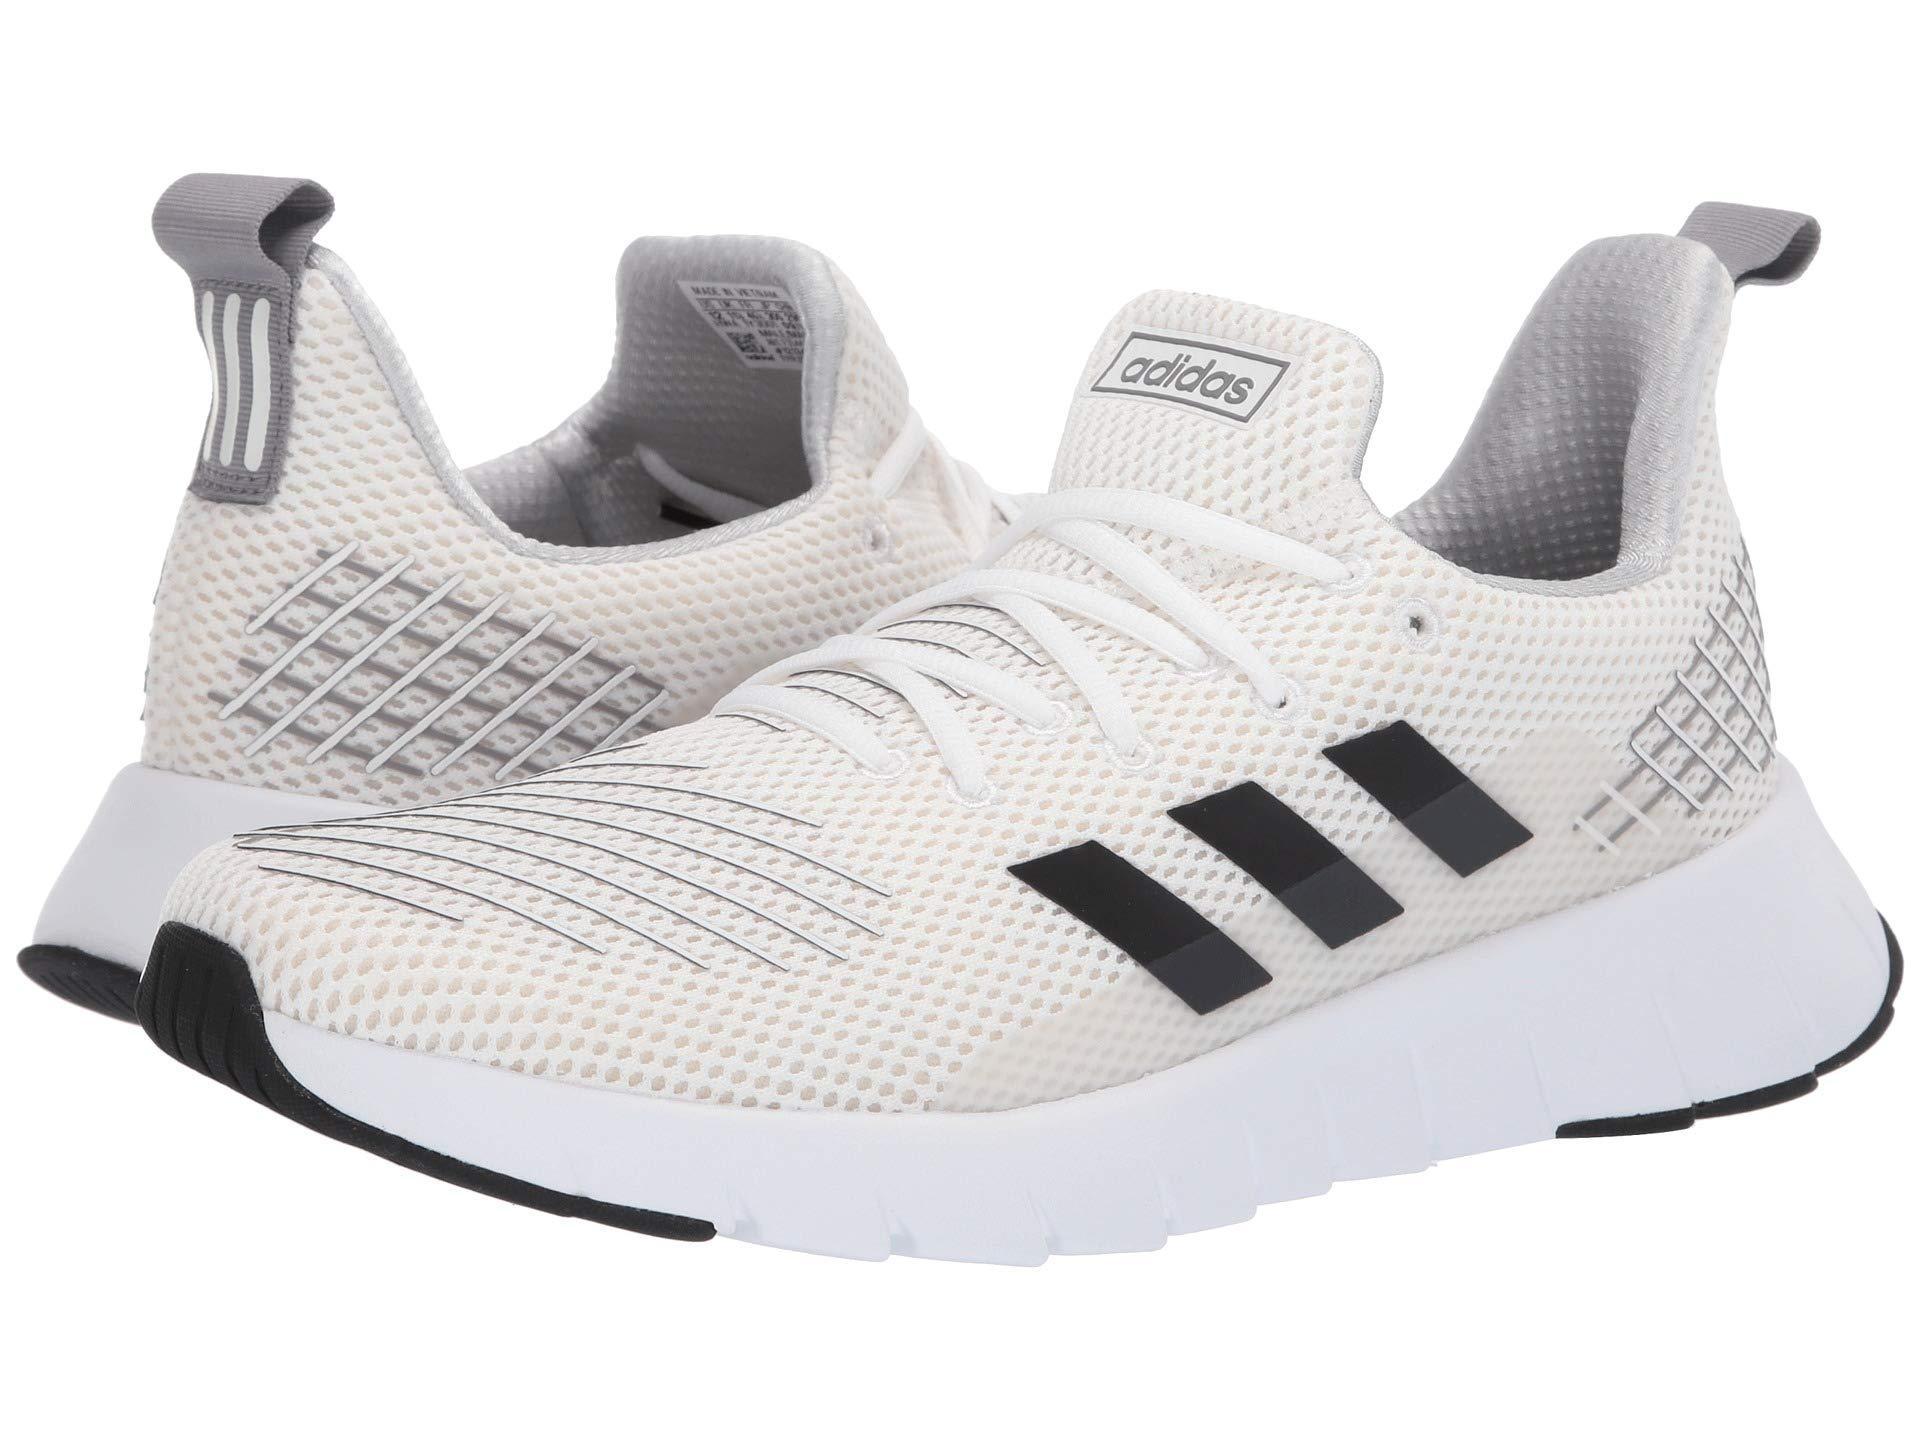 Lyst - adidas Originals Asweego (core Black footwear White solar Red ... 3b9c2cf51